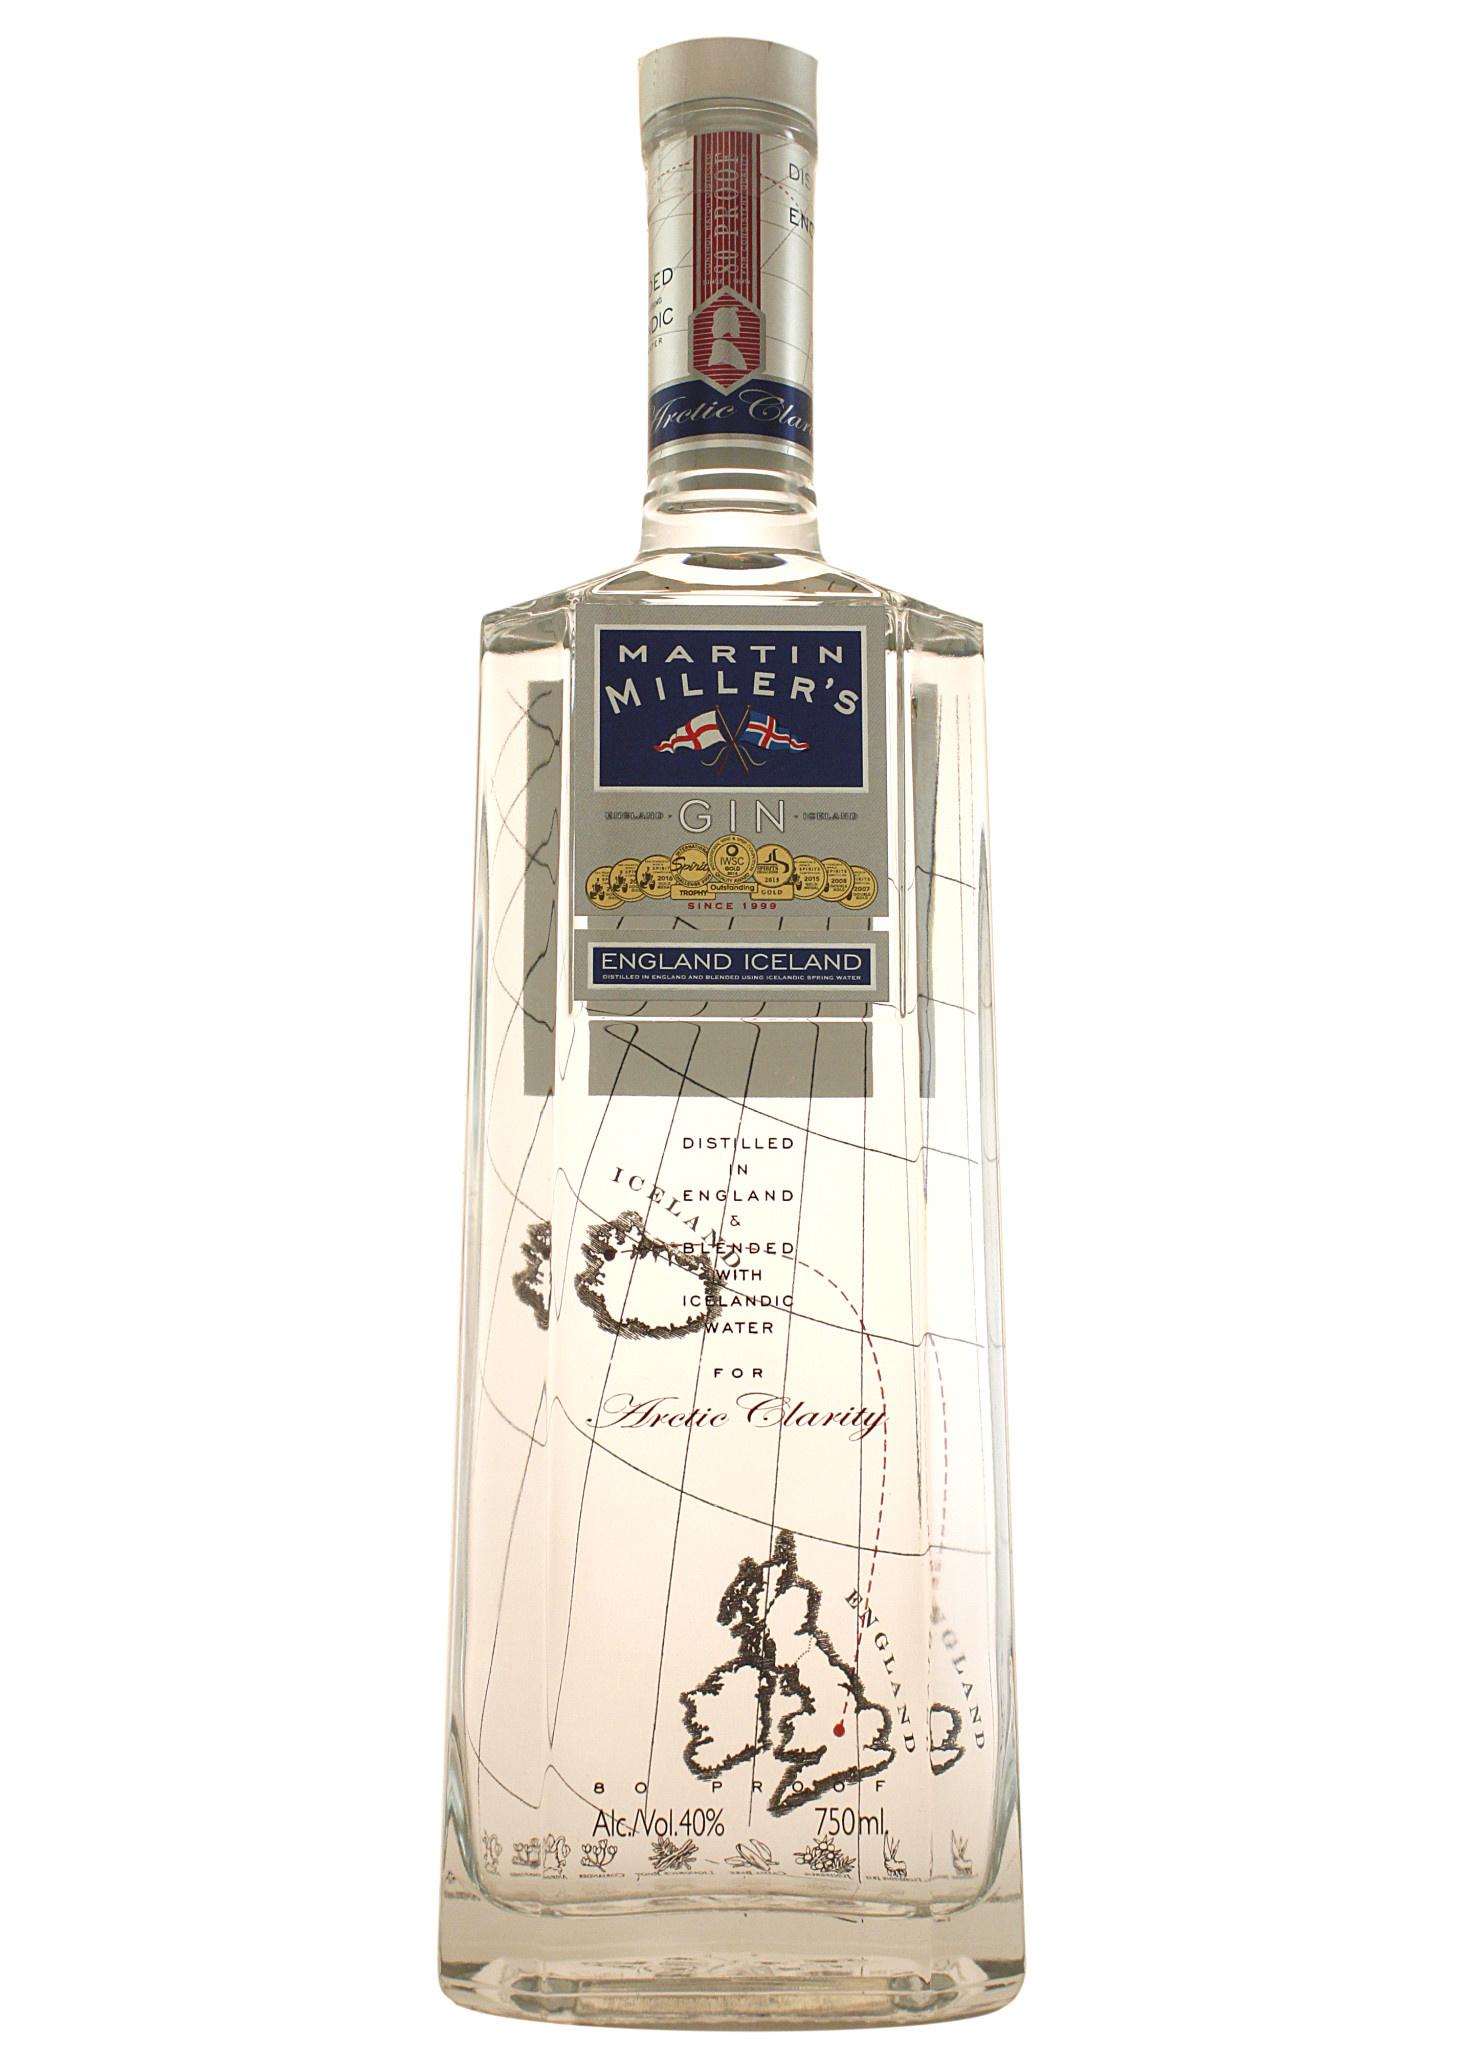 Martin Miller's Gin, England/Iceland